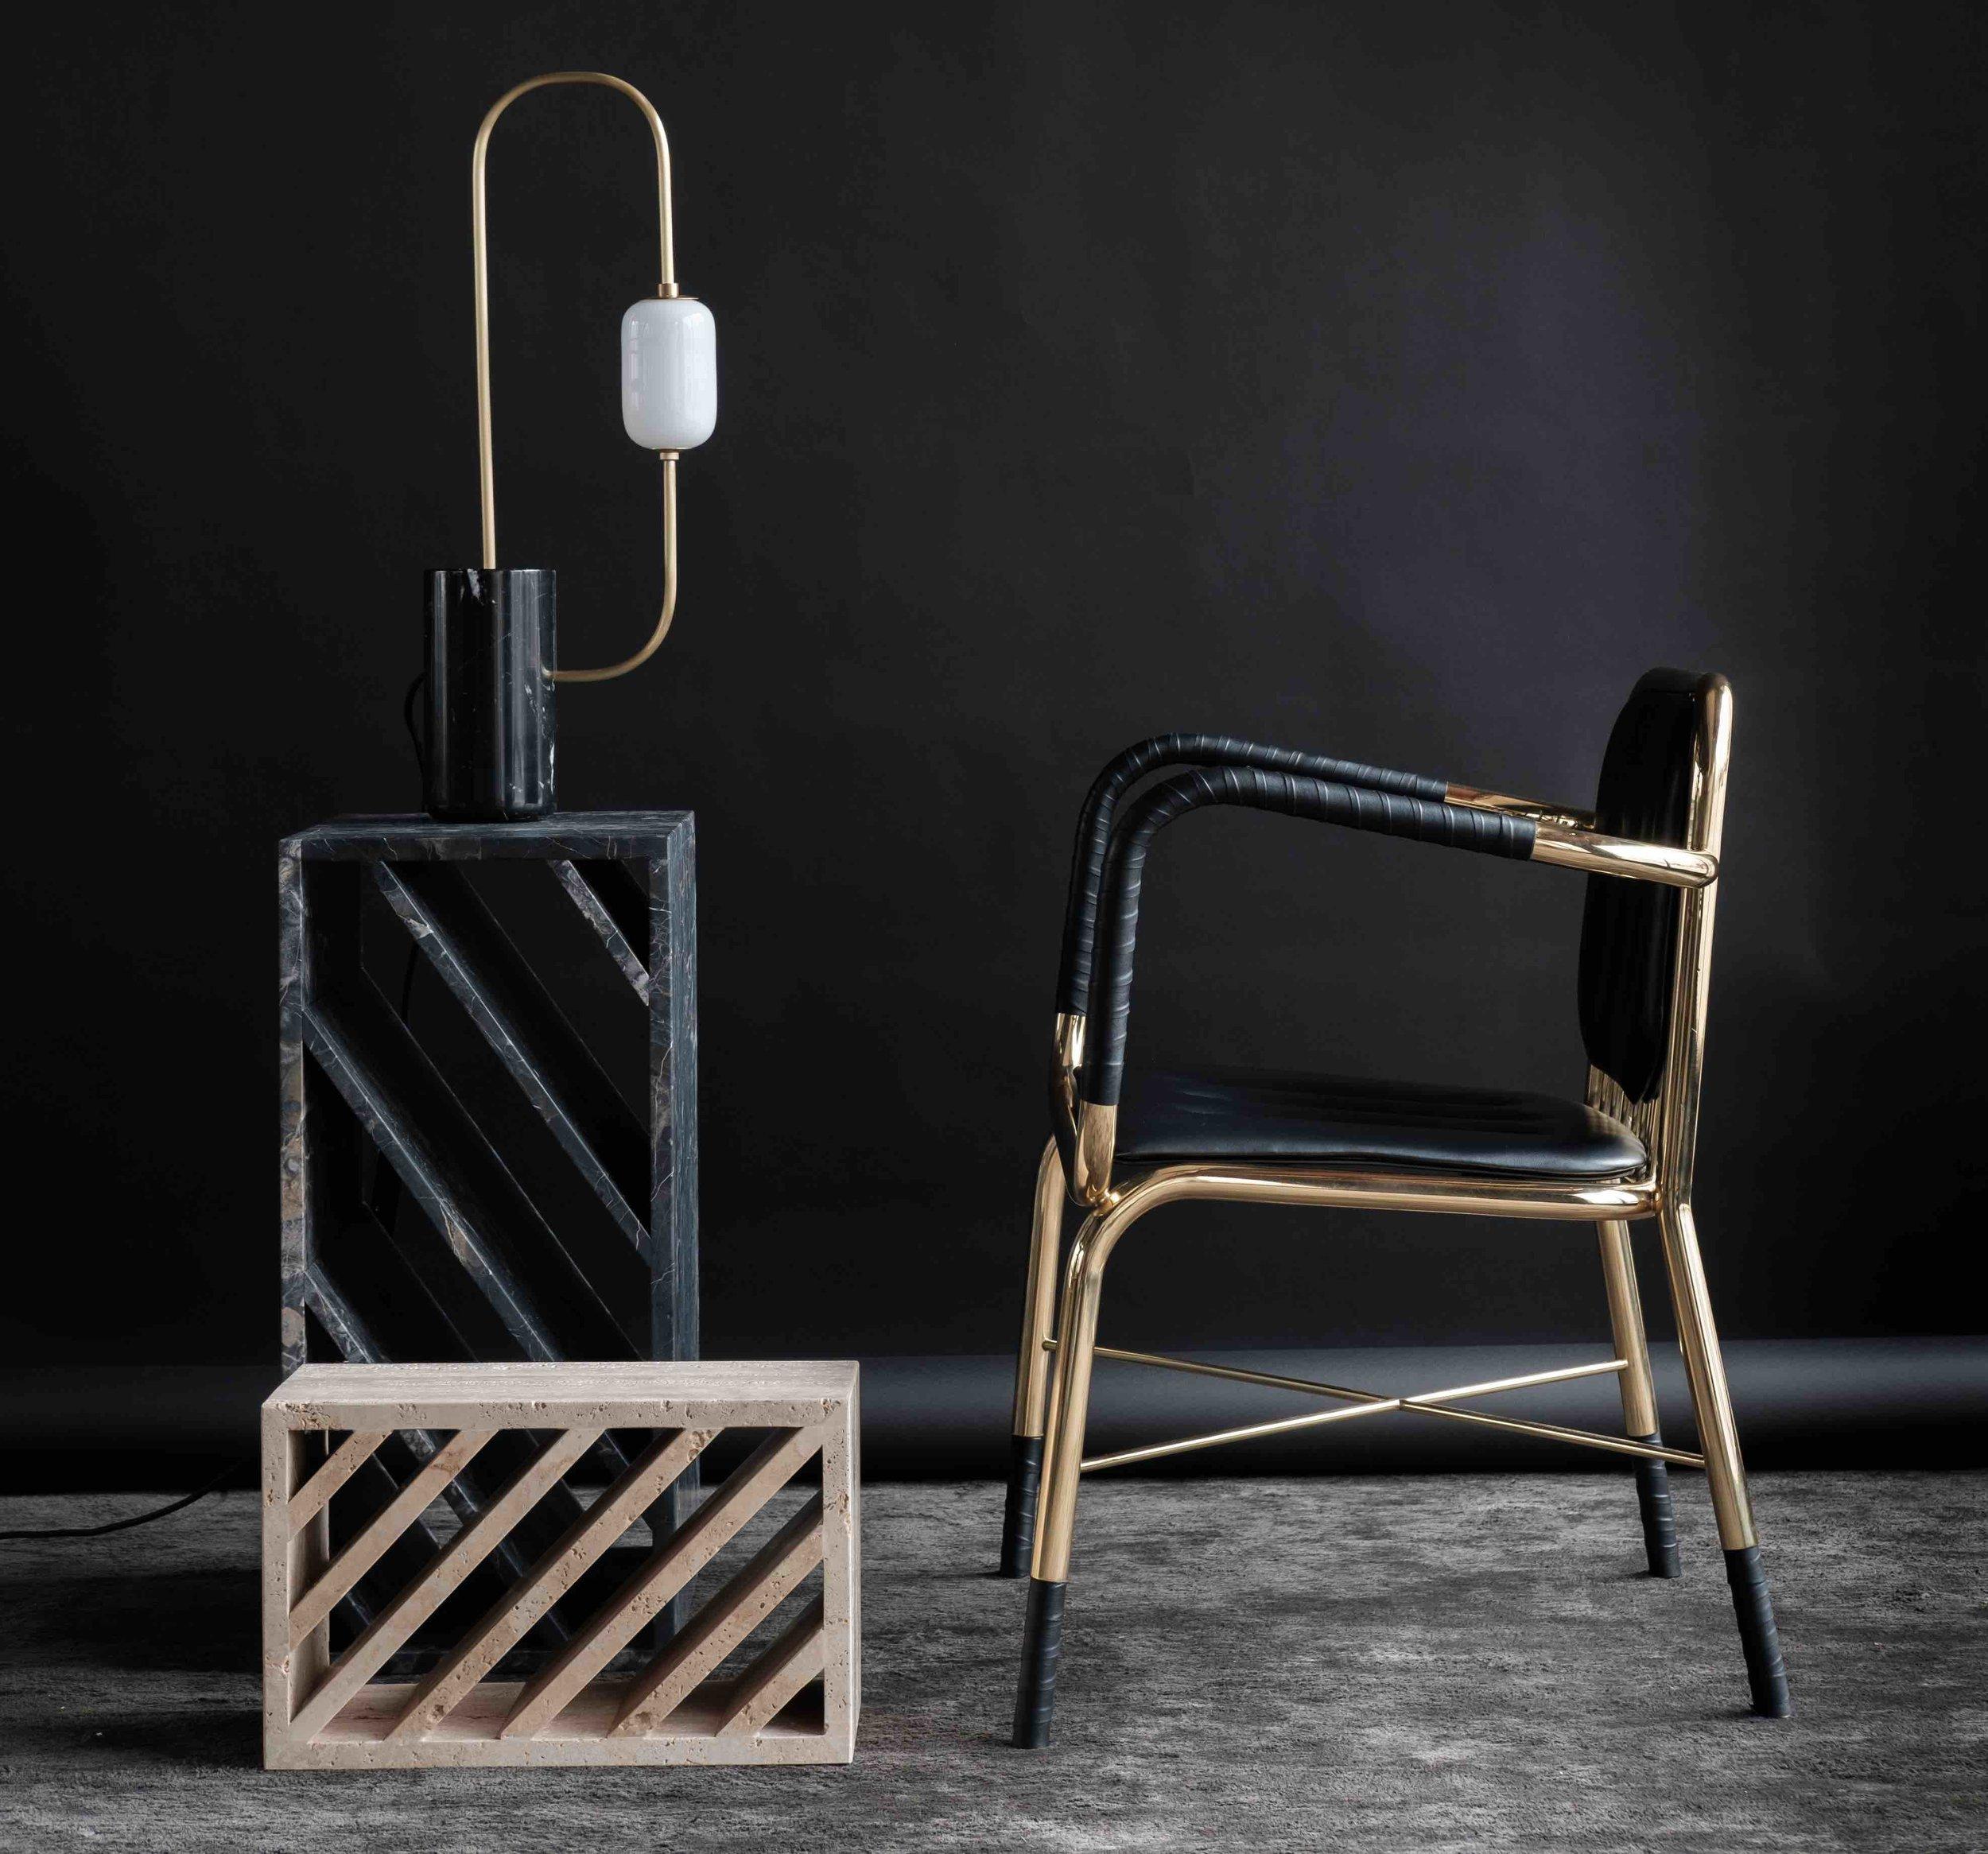 Racer-armchair-design-Dan-Yeffet-Collection_particuliere.jpg